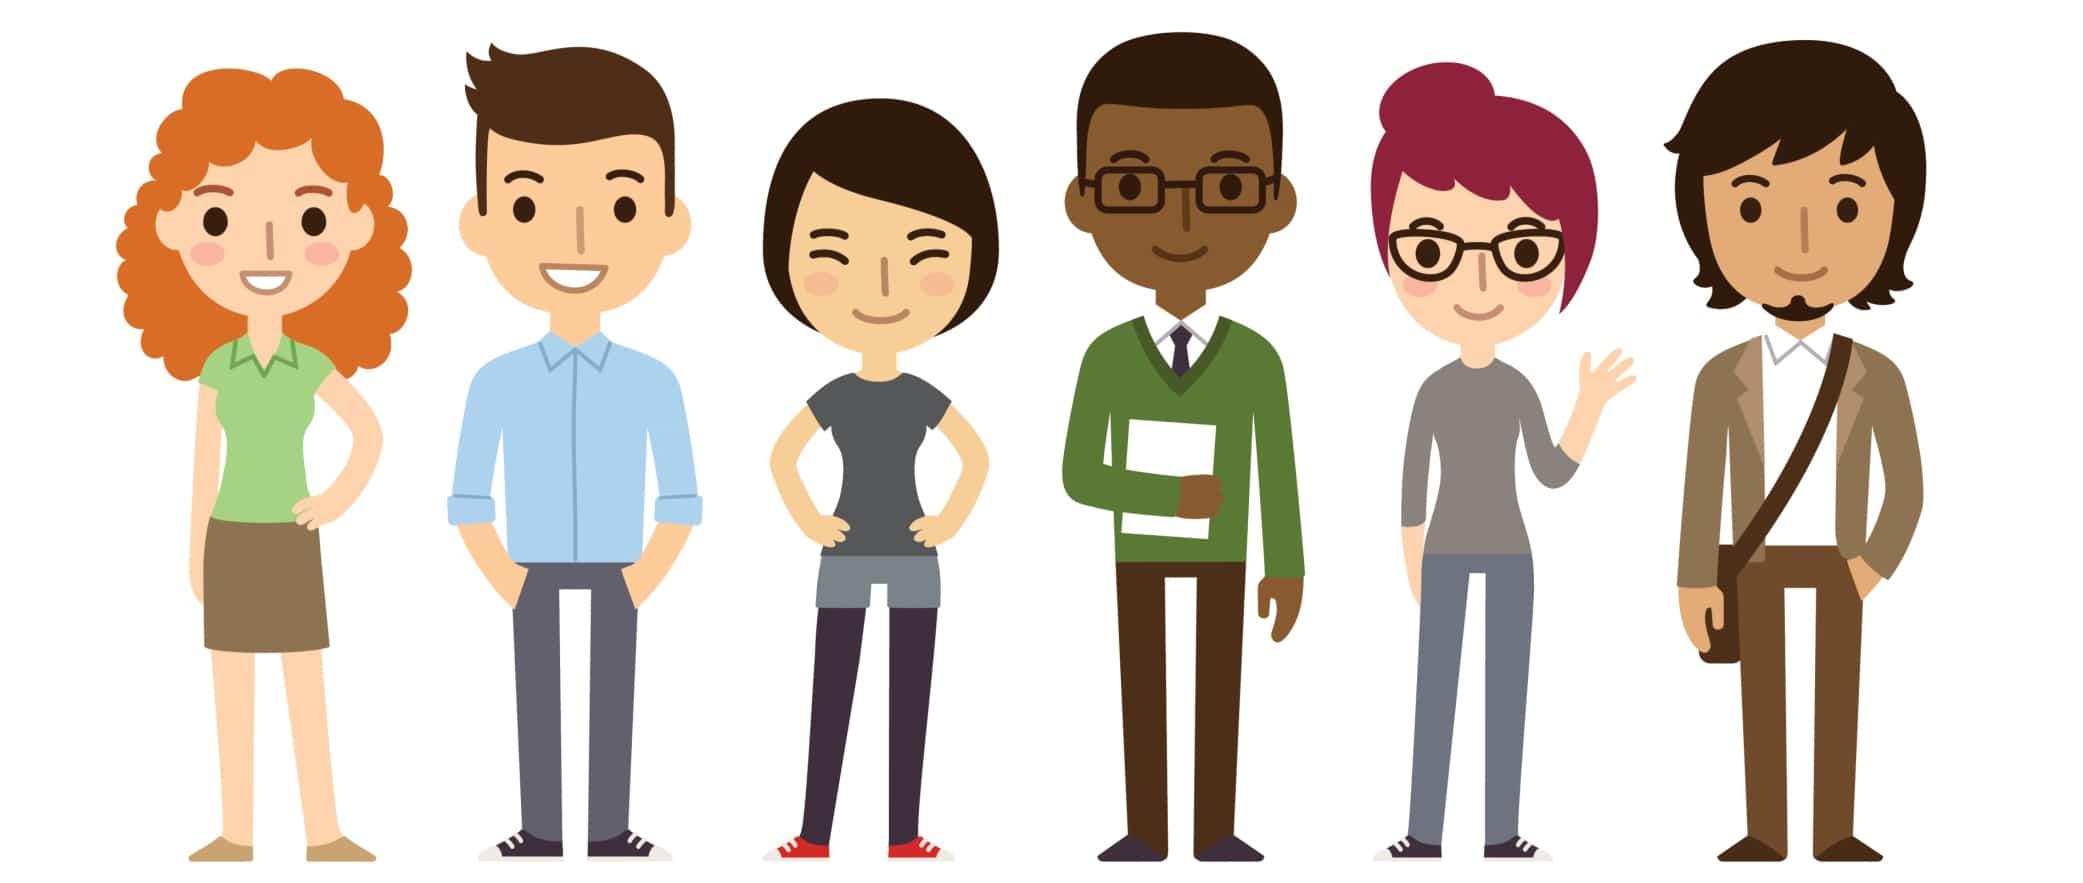 Cos'è una Buyer Persona - Cos'è un personaggio tipo - Buyer Personas - Come Definire Buyer Personas